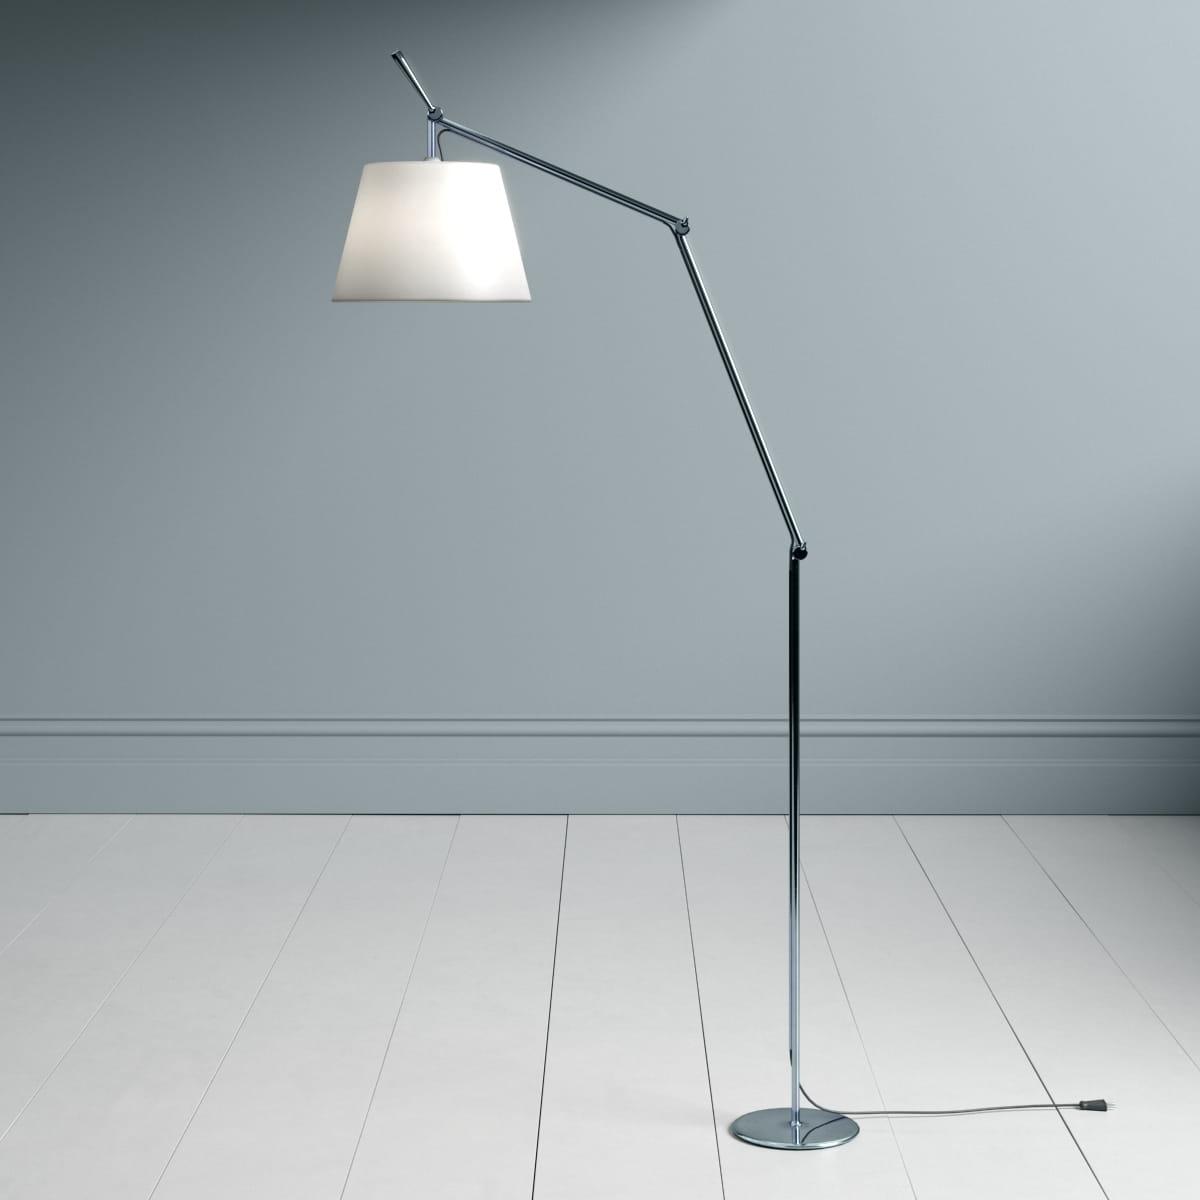 lamp 61 AM247